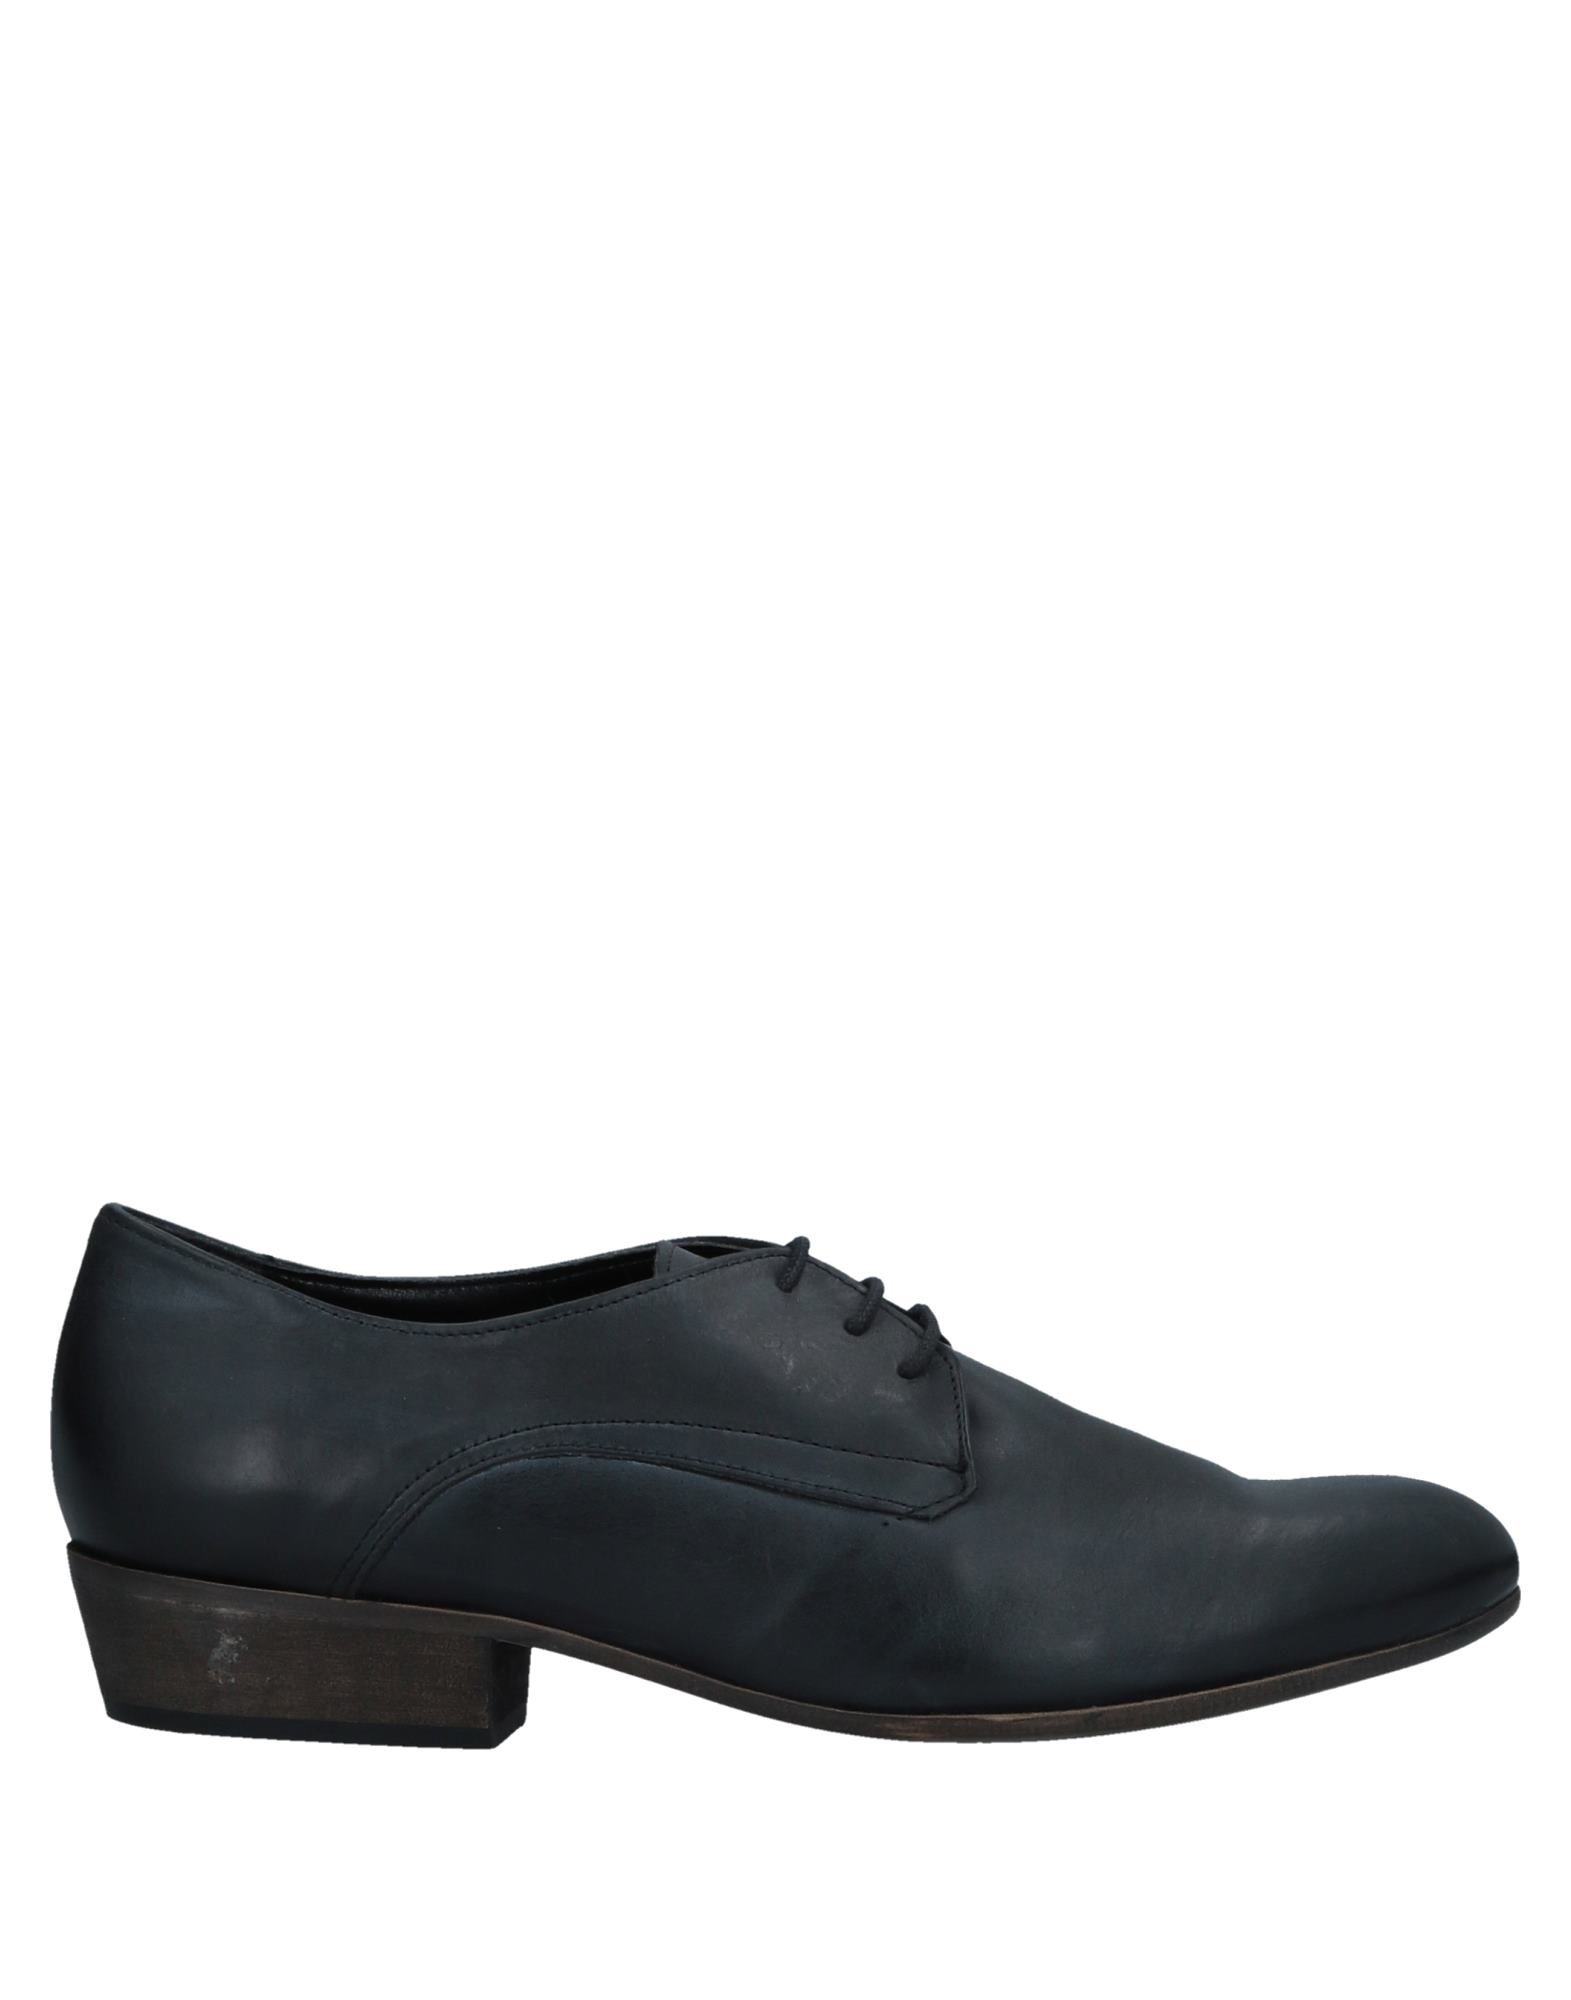 CHOCOLÀ Обувь на шнурках мужская обувь